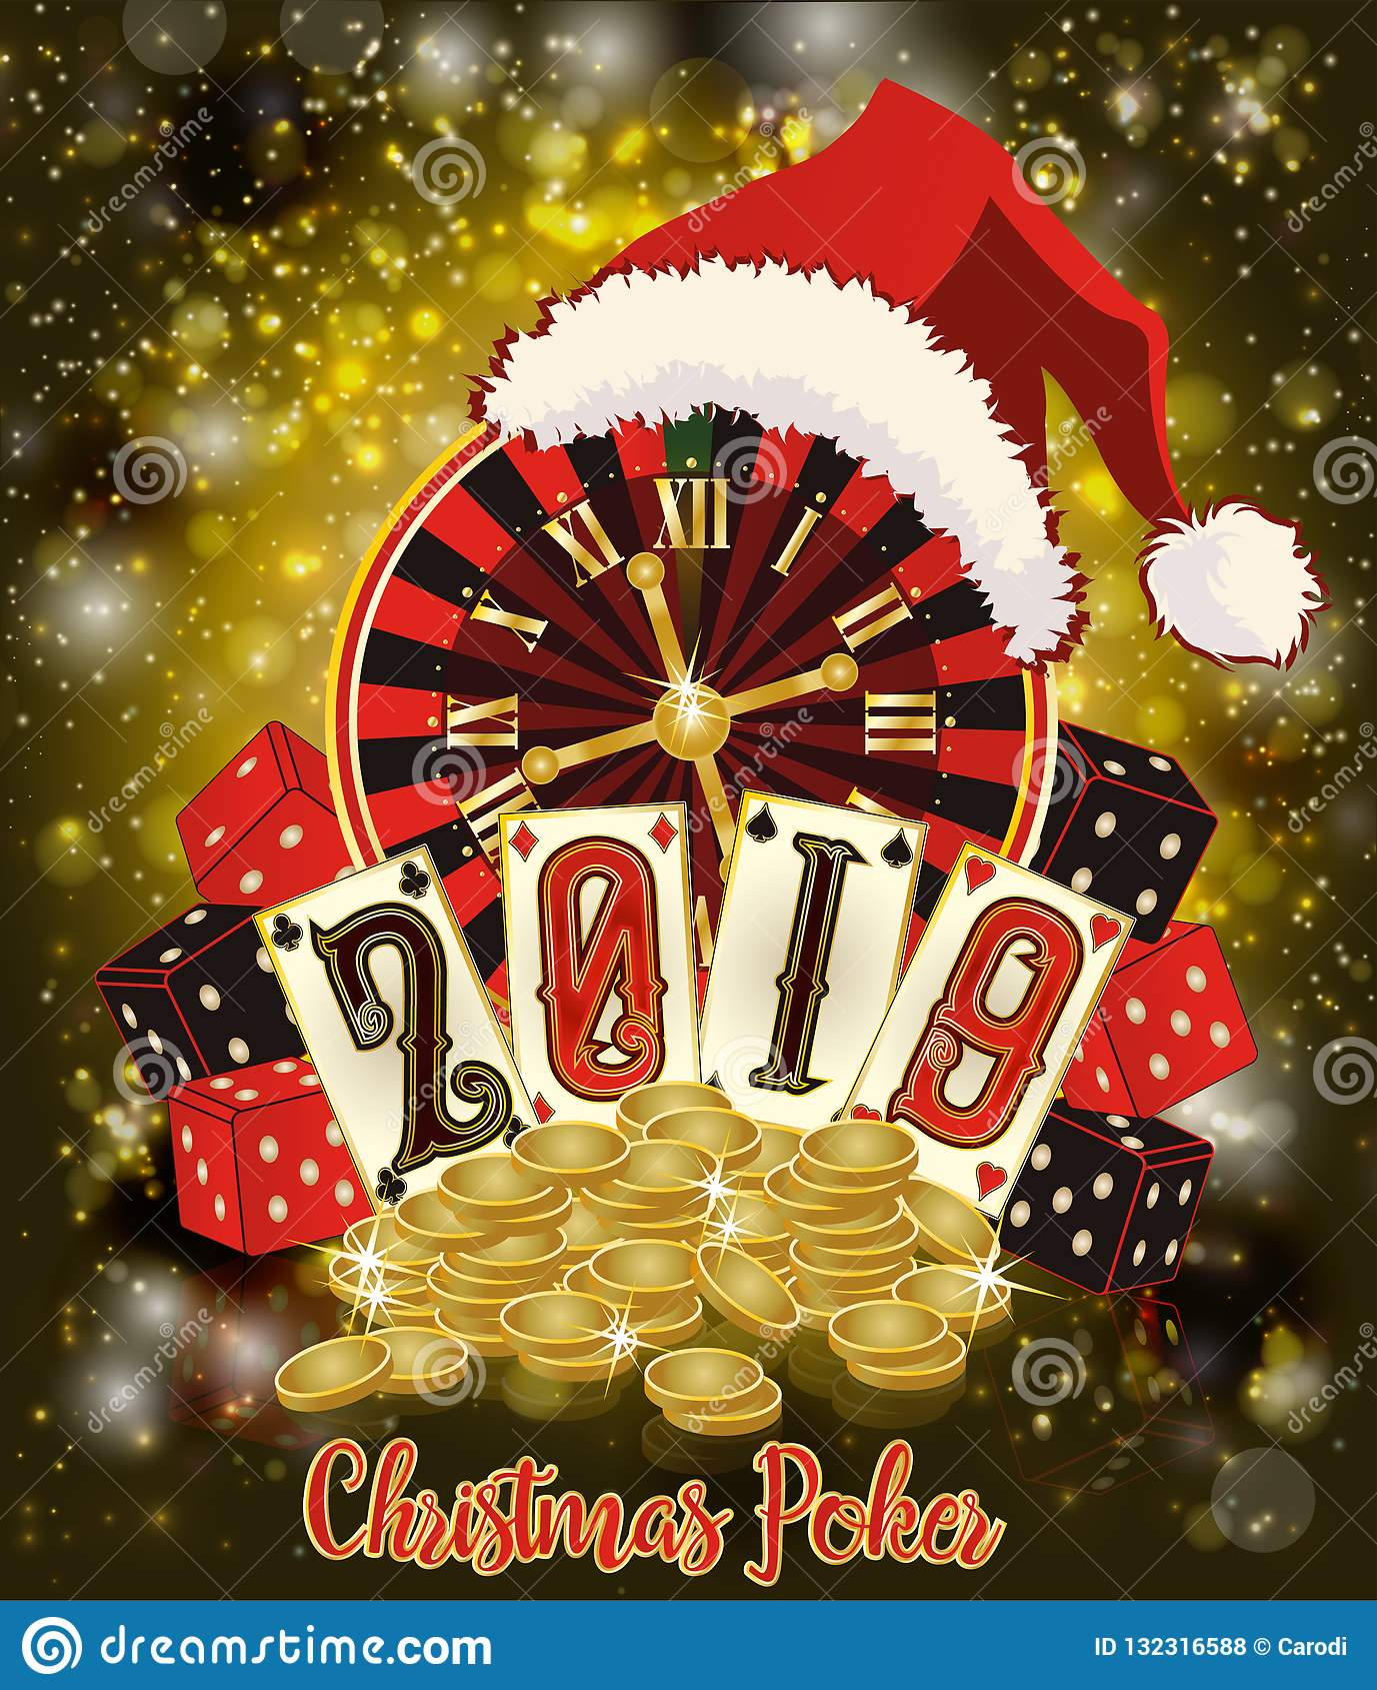 New 2019 Year Casino Wallpaper Christmas Poker Stock Vector Illustration Of Casino Chip 132316588